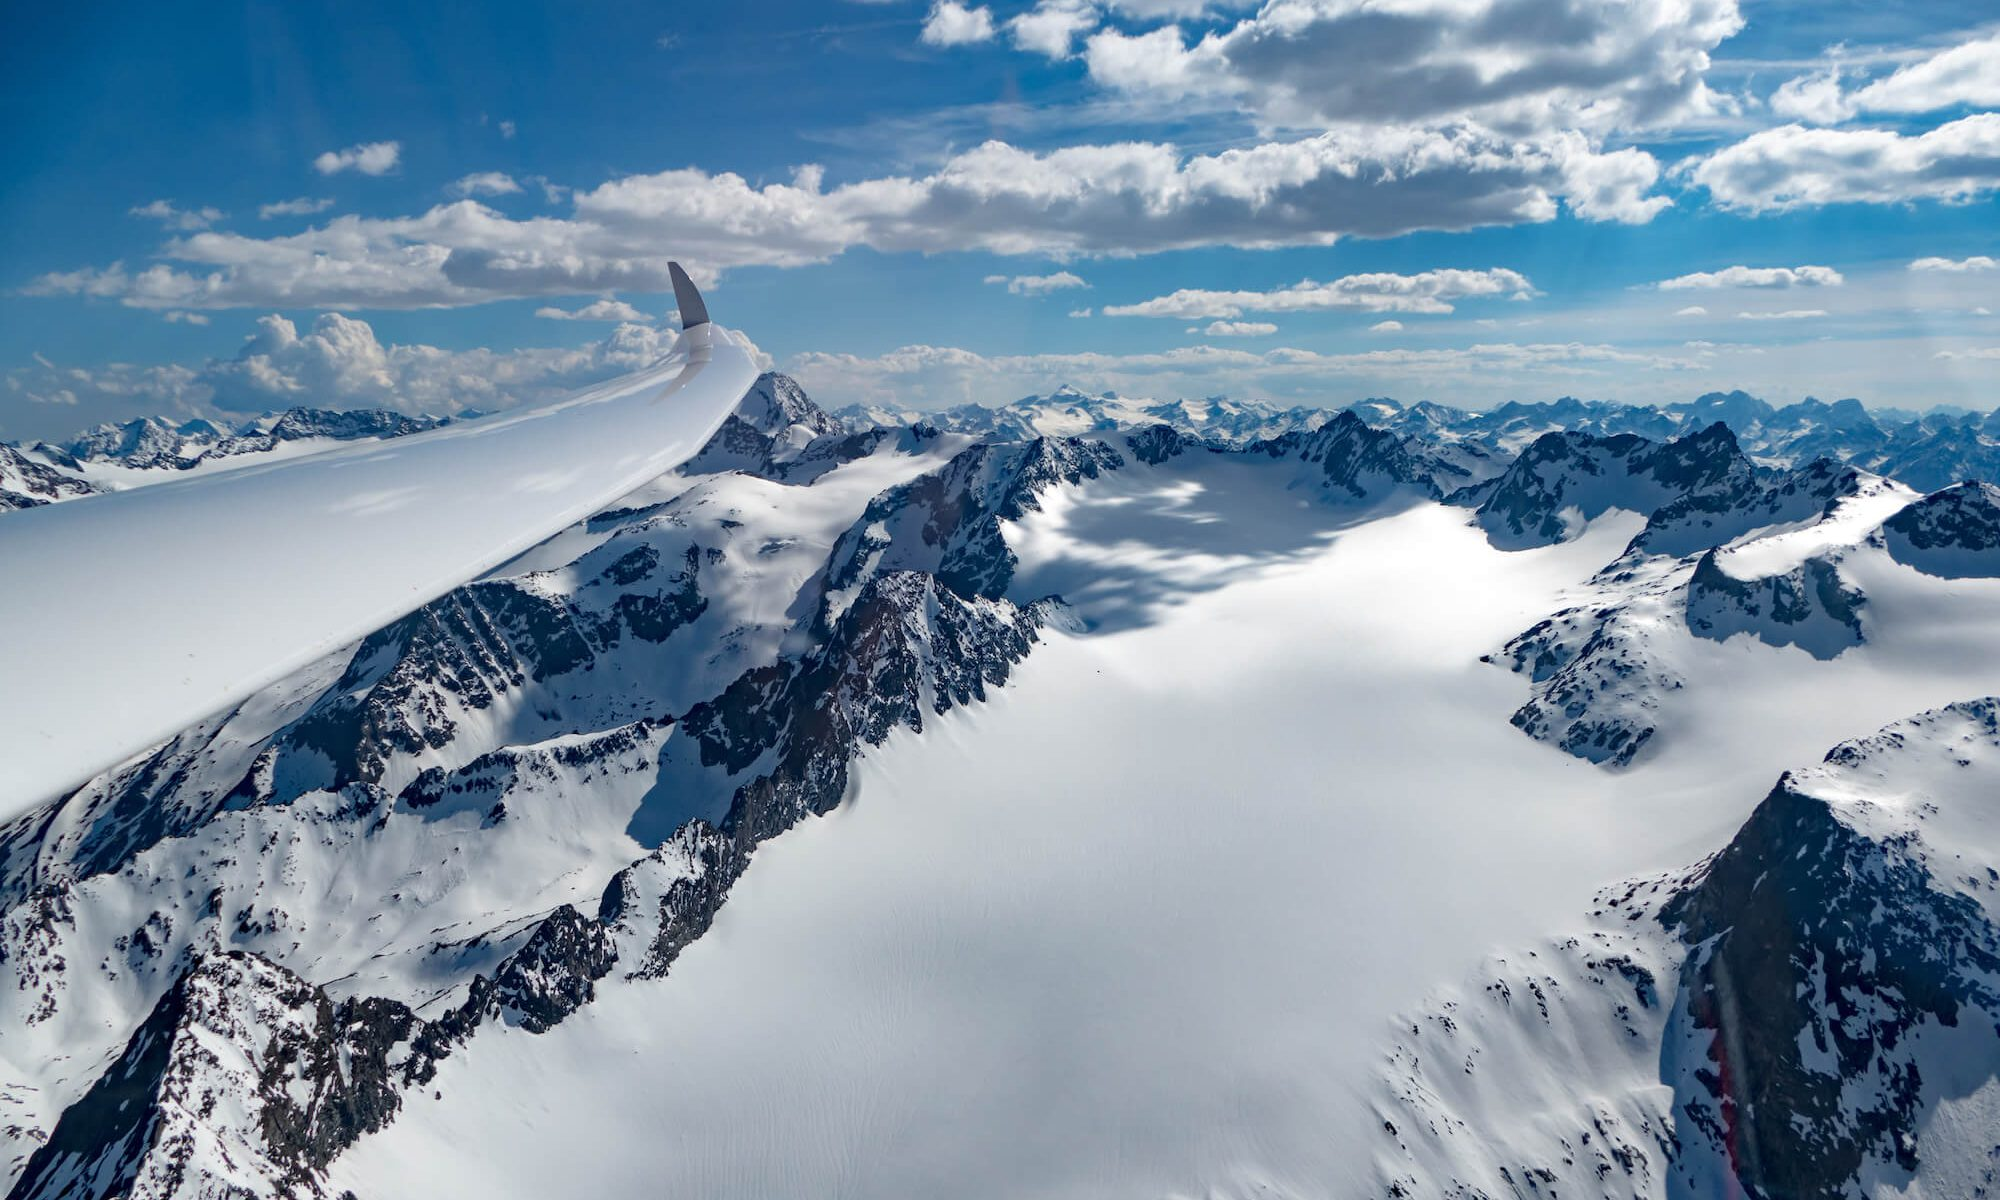 Gopro Duo Discus Fläche Winglet Alpen Alpenflug Hohenems LSV Biberach Abteilung Segelflug